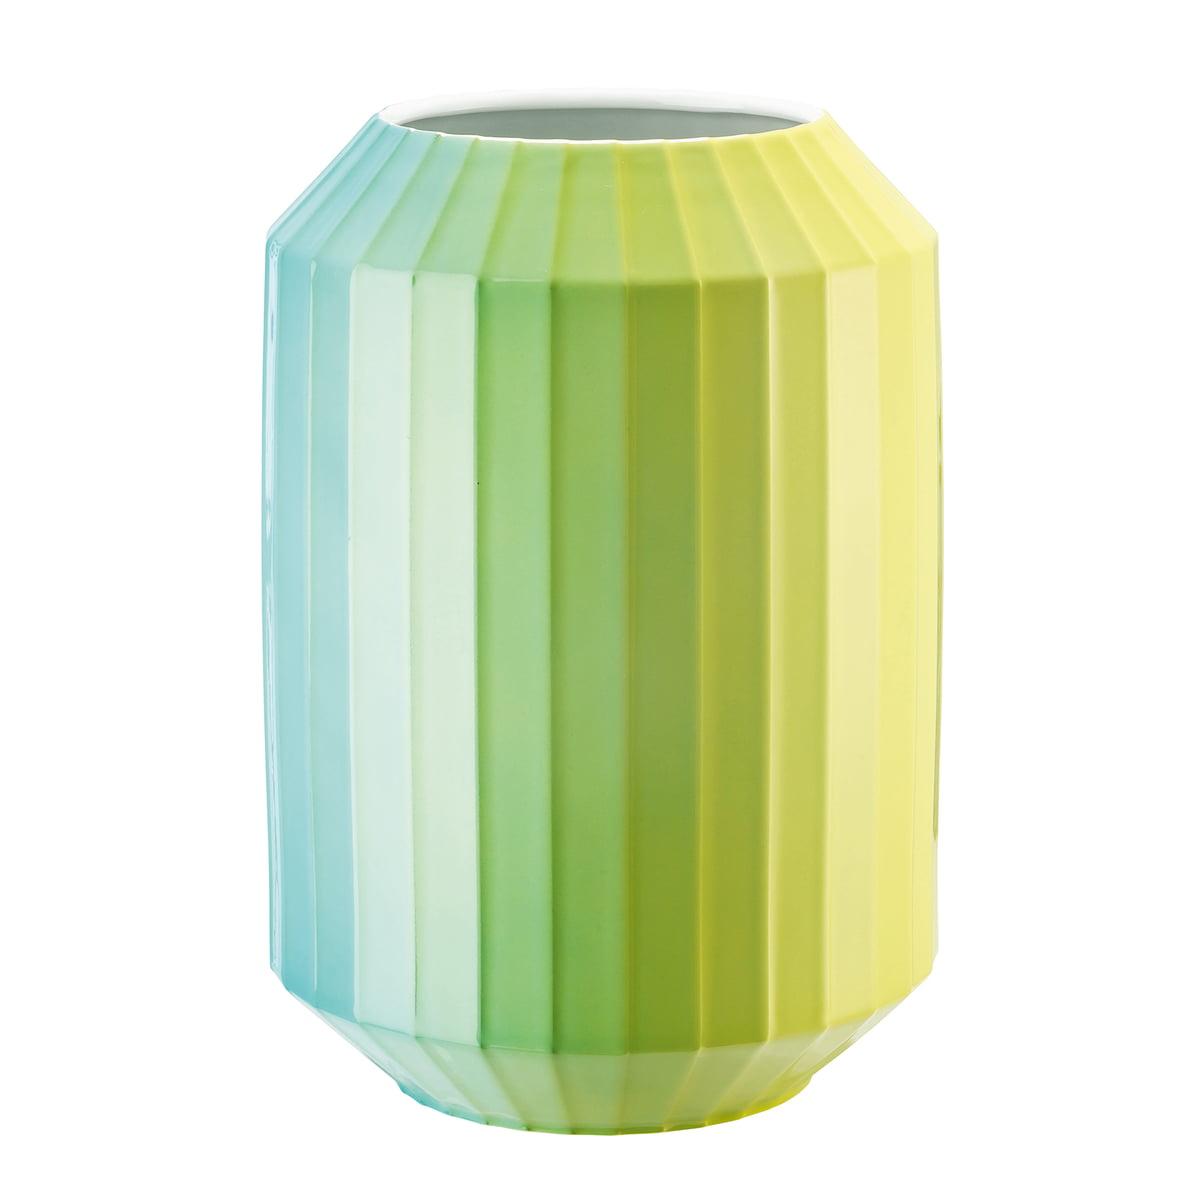 hot spot vasen von rosenthal online kaufen. Black Bedroom Furniture Sets. Home Design Ideas